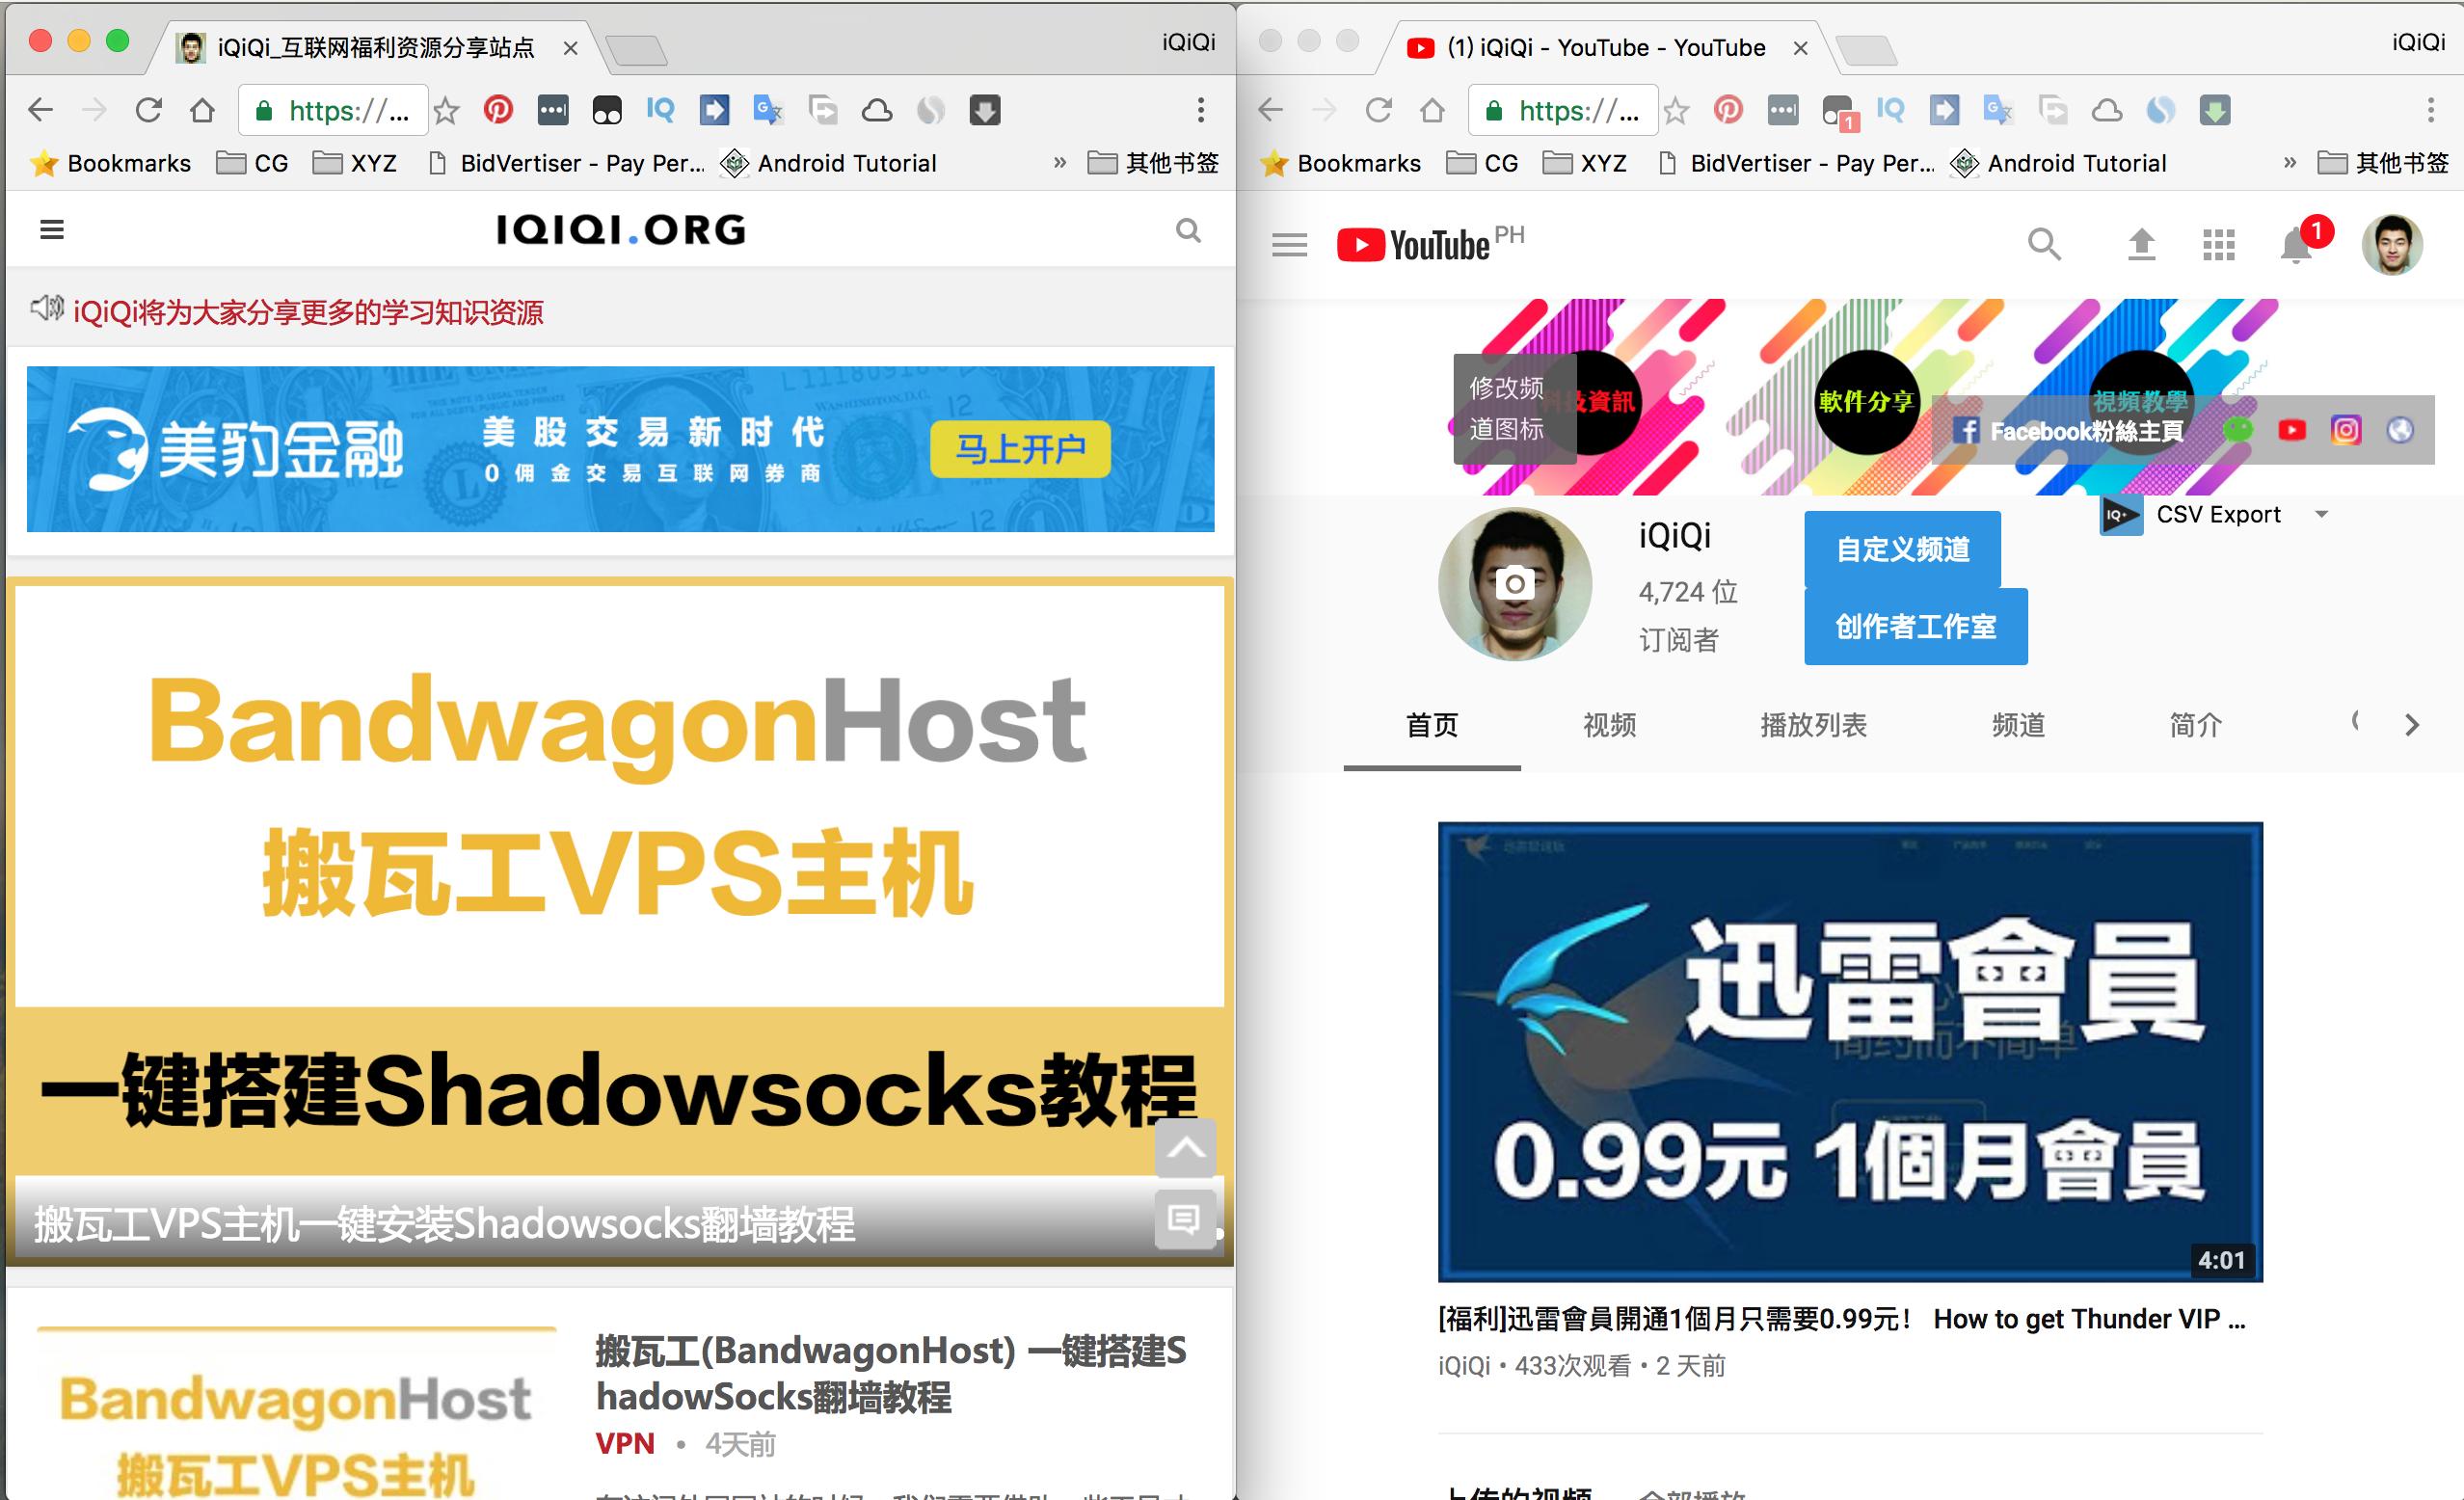 Chrome浏览器多视窗显示,让你充分利用屏幕空间!-iQiQi